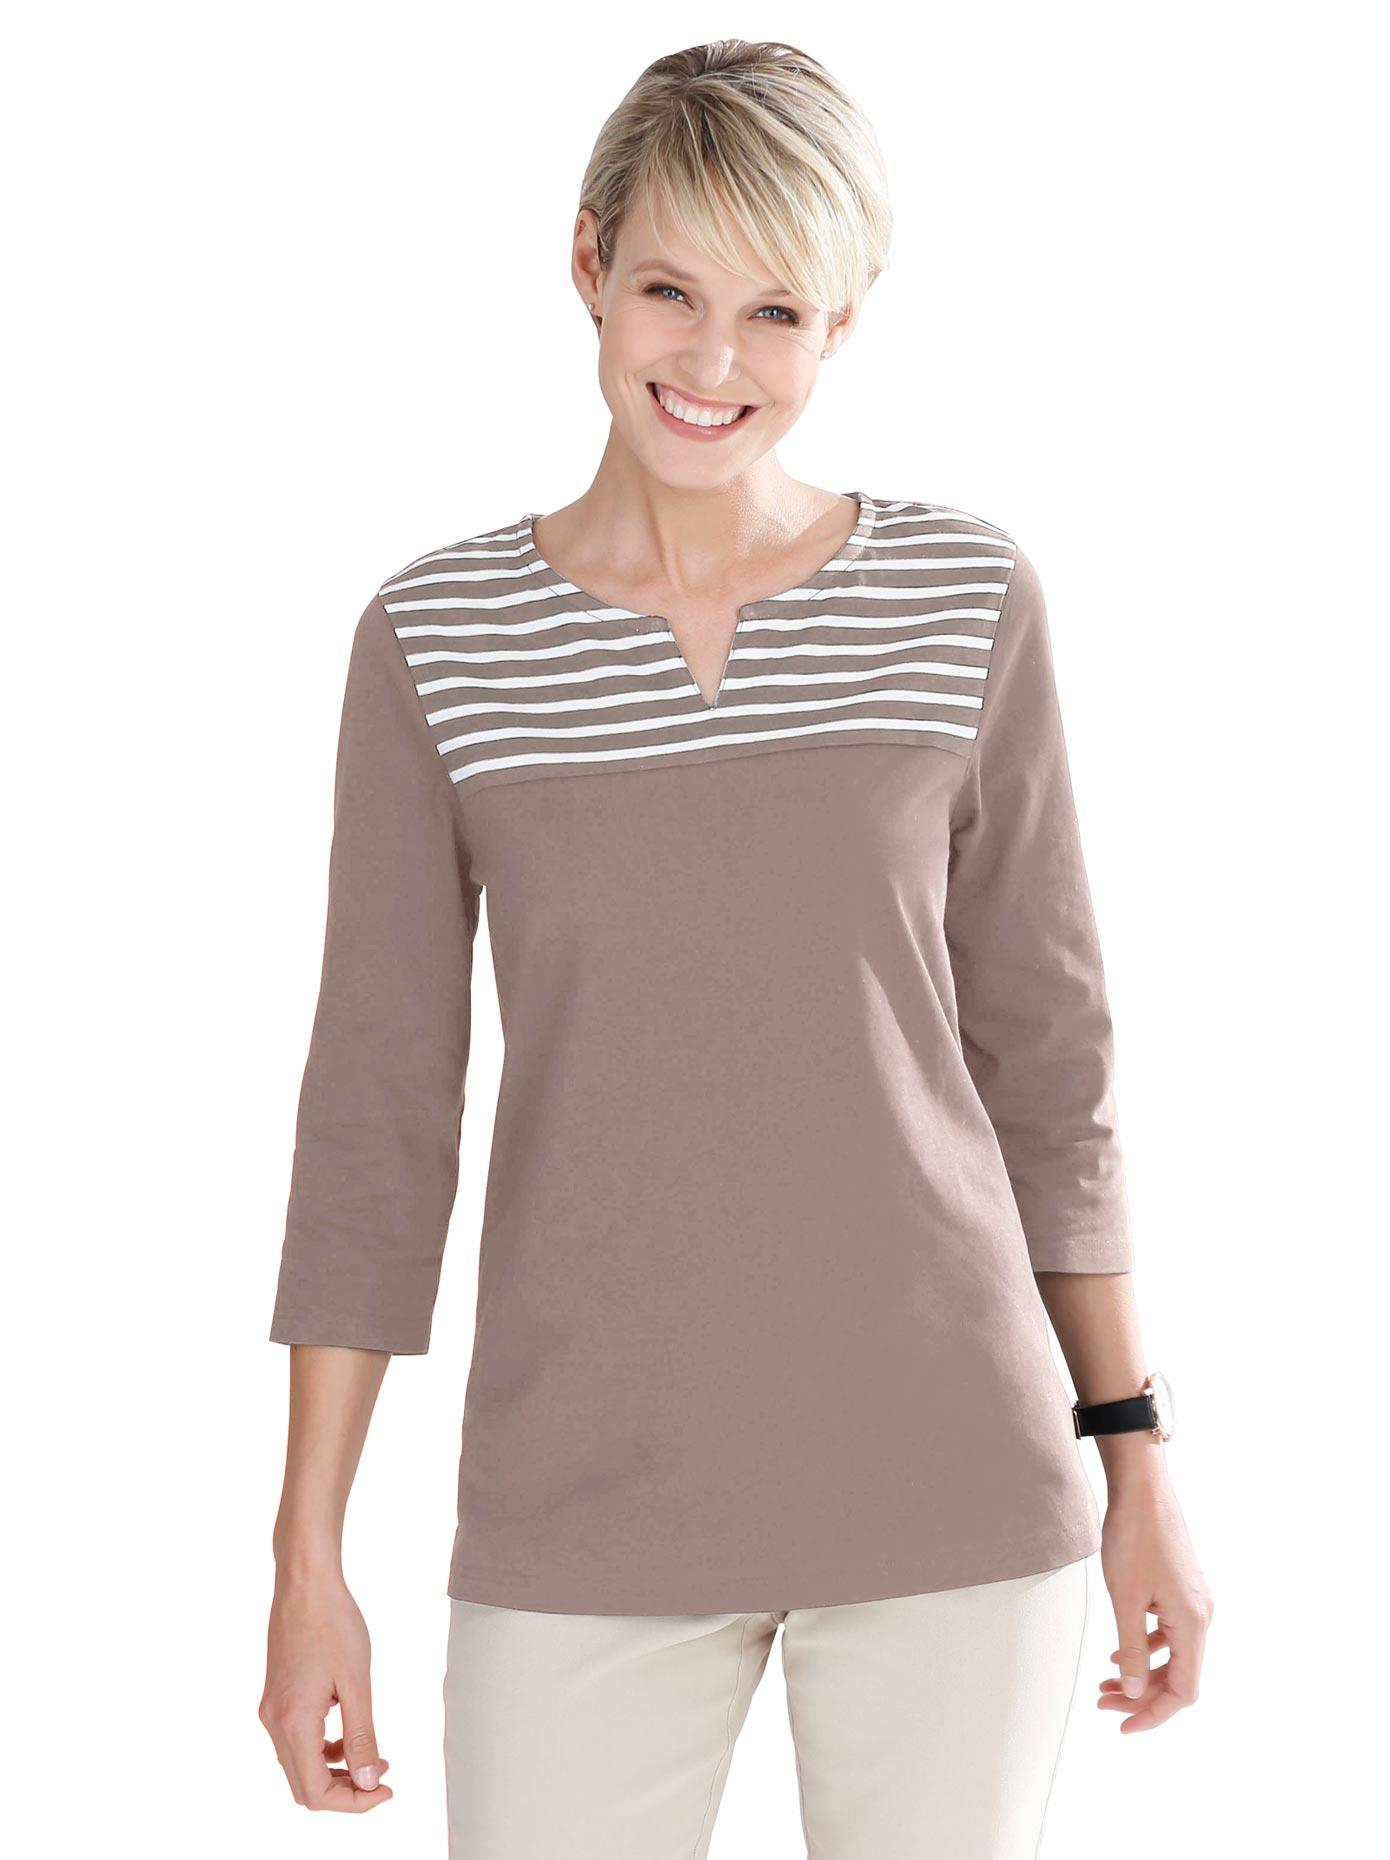 Classic Basics Shirt in trageangenehmer Qualität | Bekleidung > Shirts | Grau | Classic Basics